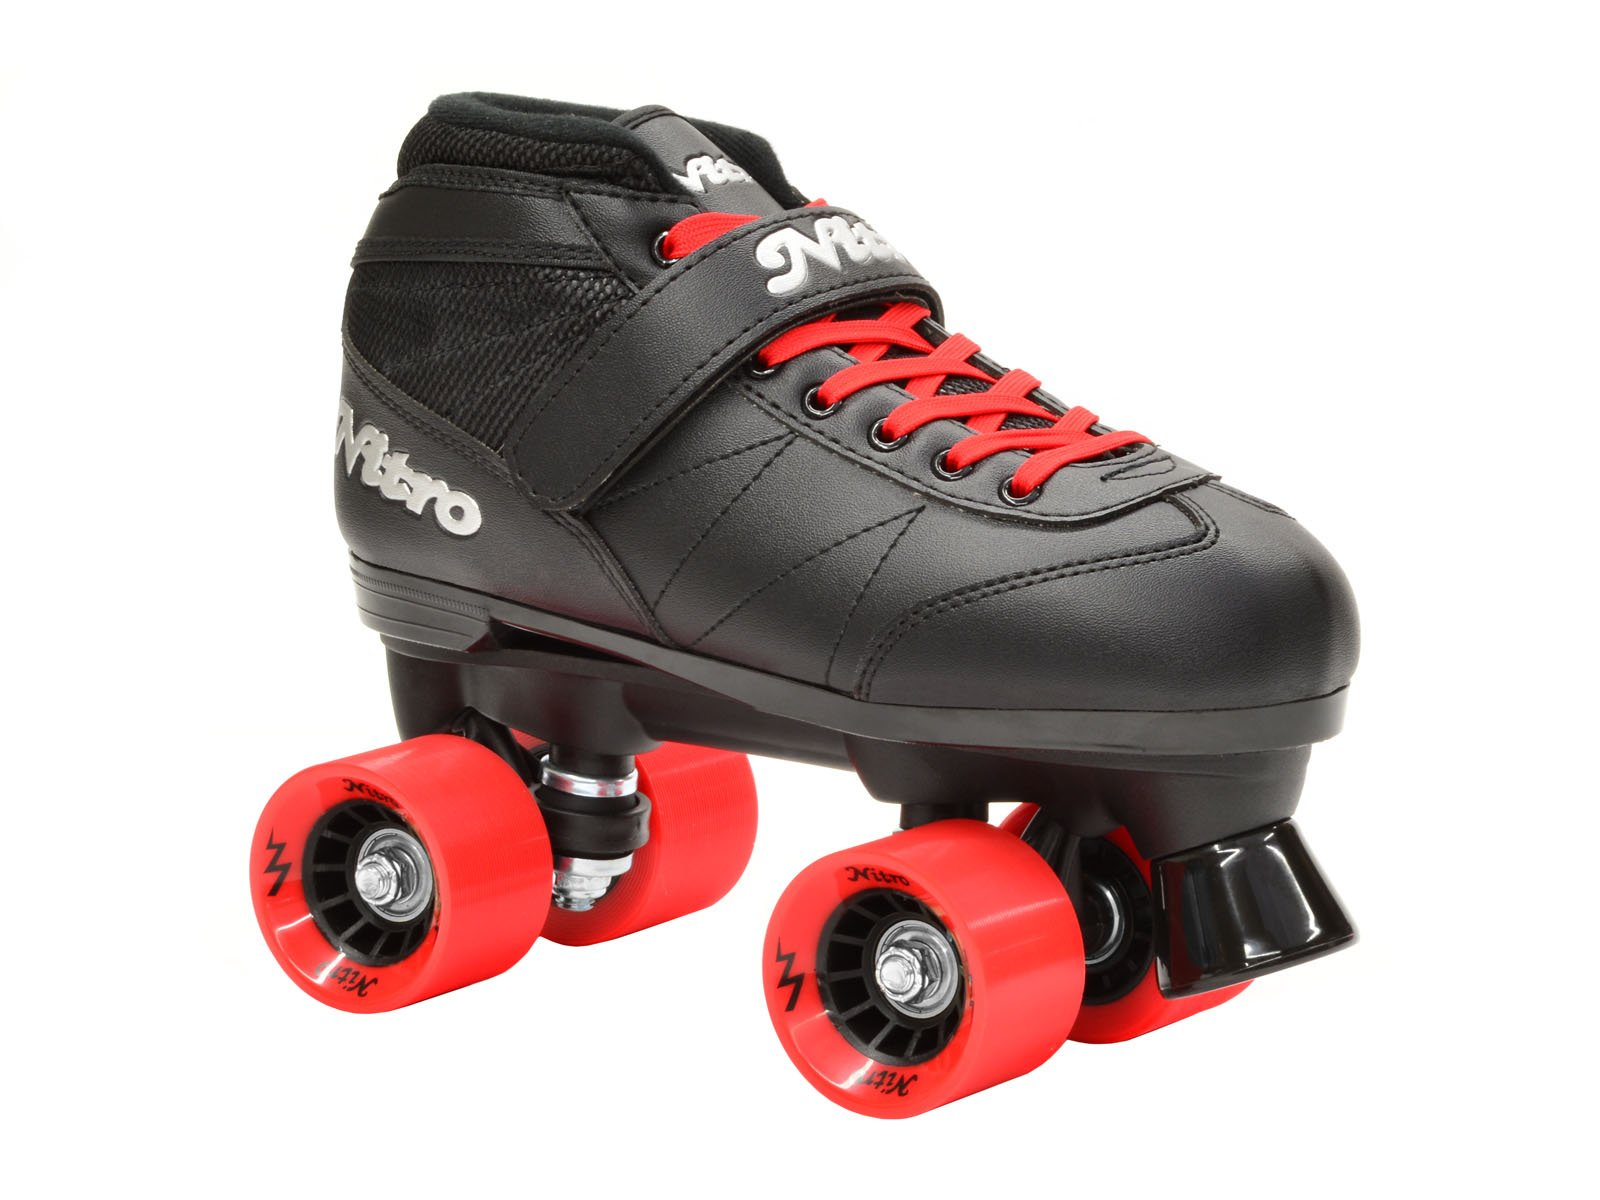 Epic Skates Super Nitro Red Quad Speed Skates, Black/Red, Adult 5